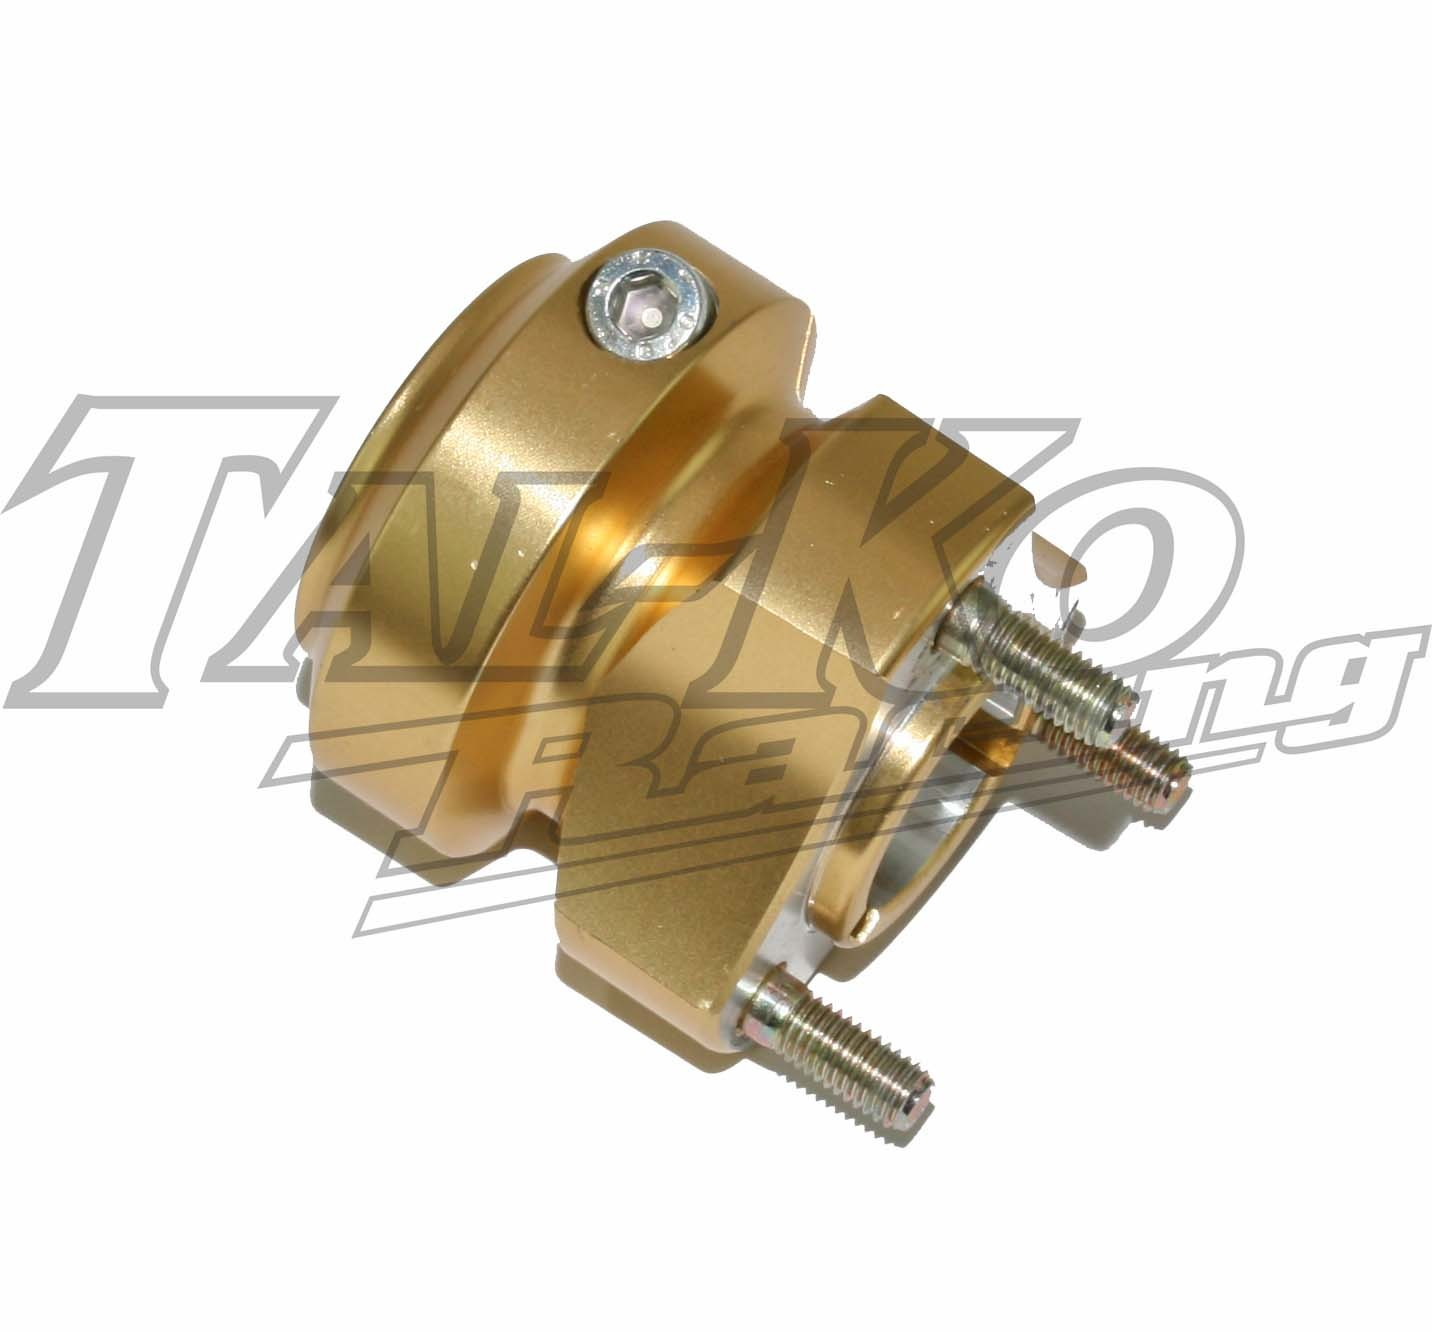 R/R REAR WHEEL HUB SHORT 30mm x 67 GOLD